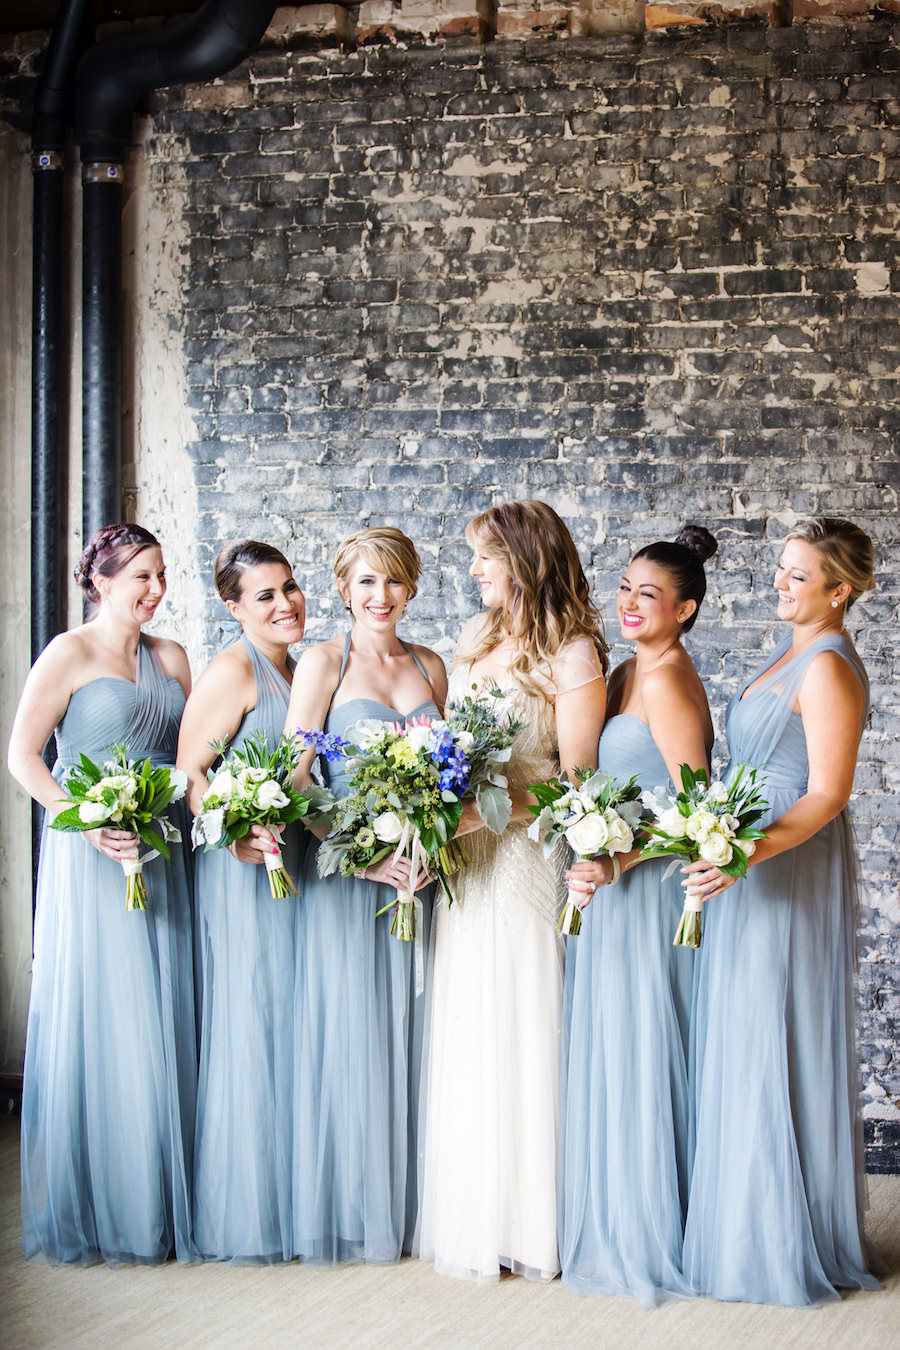 Tampa Bridal Party Wedding Portrait with Grey Blue Jenny Yoo Chiffon Bridesmaid Dresses and Ivory Beaded Jenny Packham Wedding Dress | Tampa Wedding Makeup Artist Lindsay Does Makeup